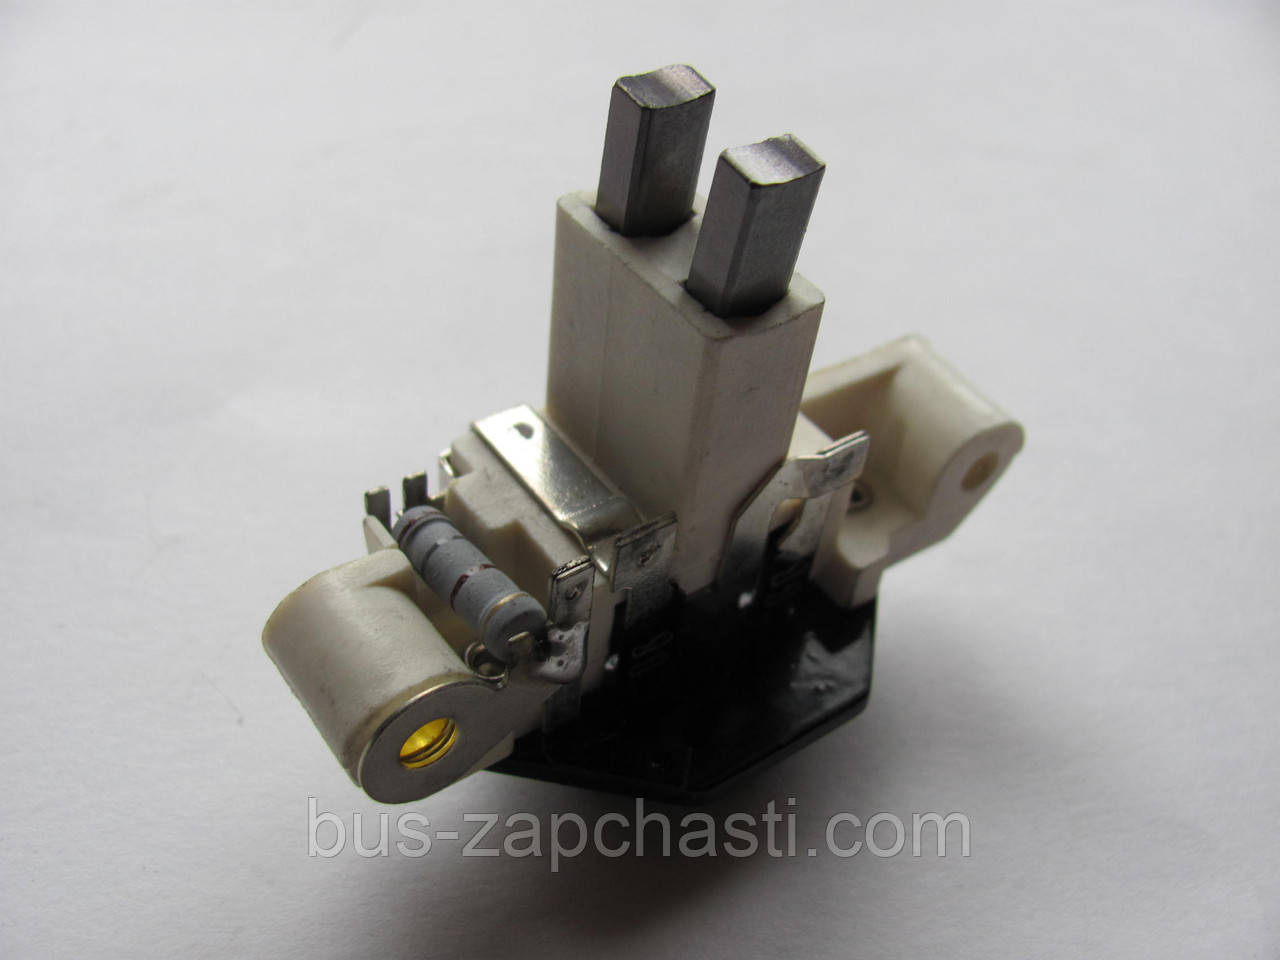 Реле генератора (12 V) MB Sprinter, Vito TDI/ VW LT 2.5 TDI (OM601/602) 1996-2006 — Autotechteile — 100 0387